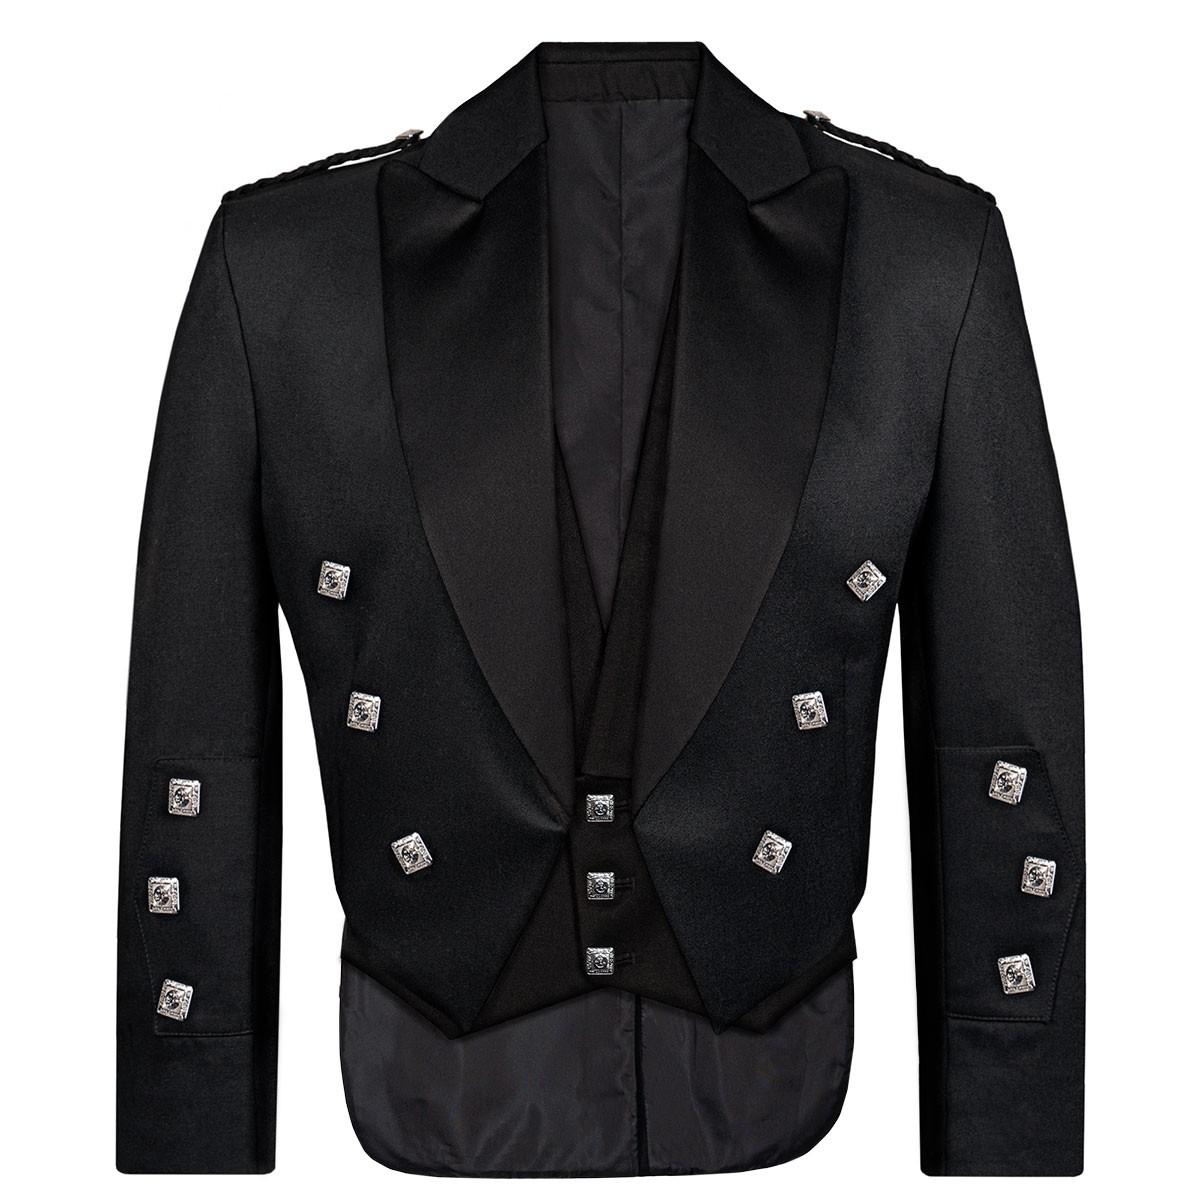 Barathea Heavyweight Fabric Prince Charlie Kilt Jacket & Vest